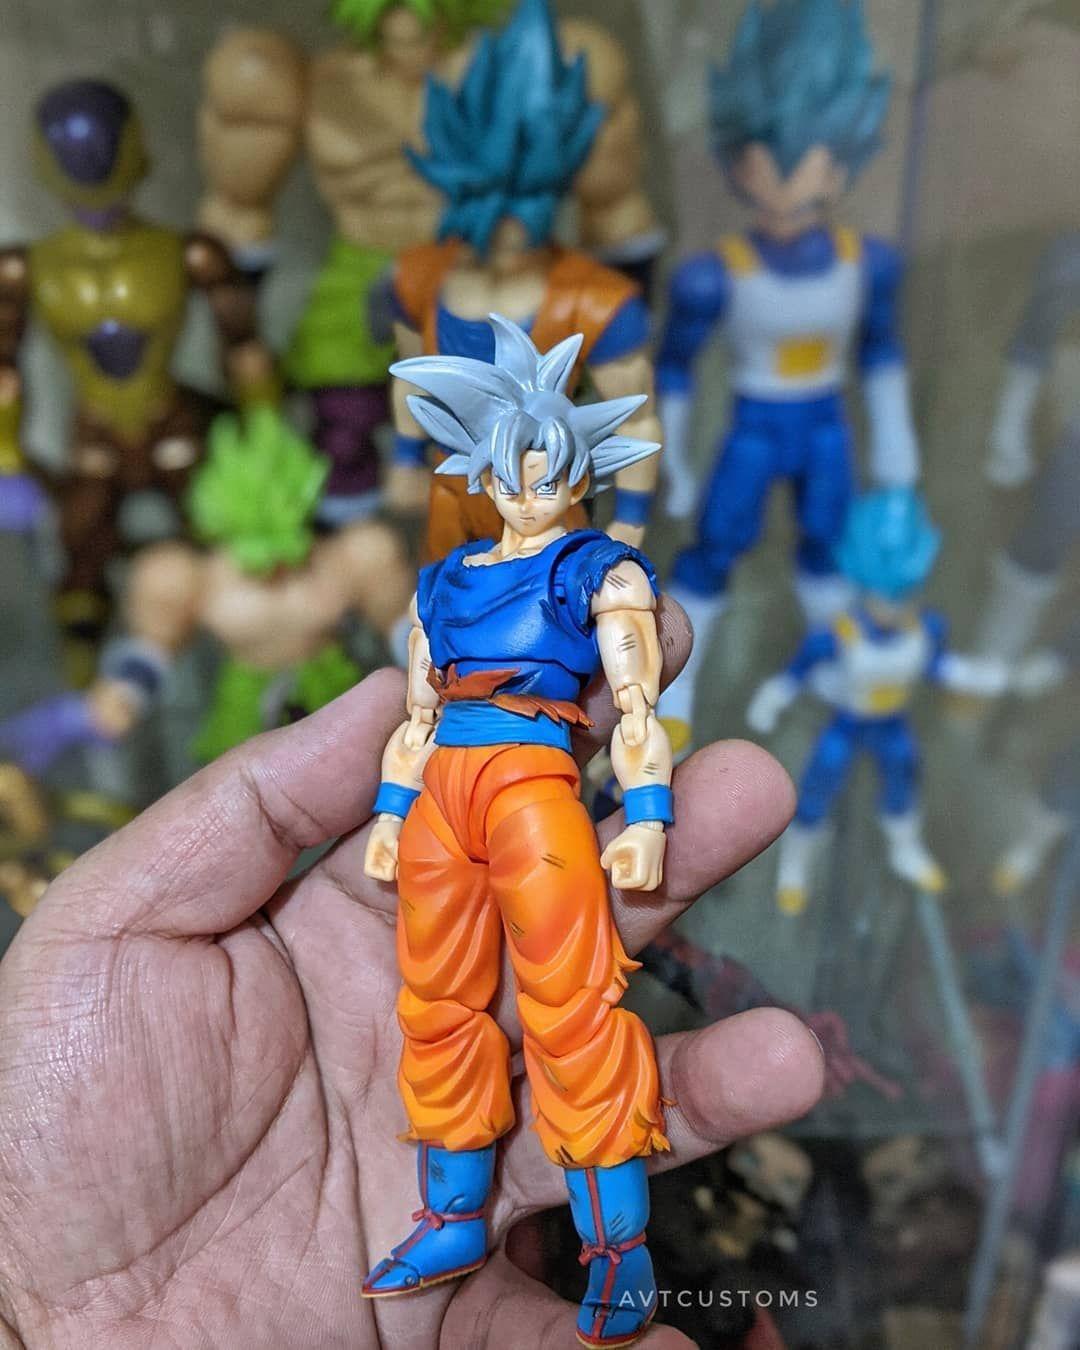 Shf Mastered Ultra Instinct Goku Manga Version By Avtcustoms Anime Dragon Ball Super Dragon Ball Super Goku Anime Dragon Ball